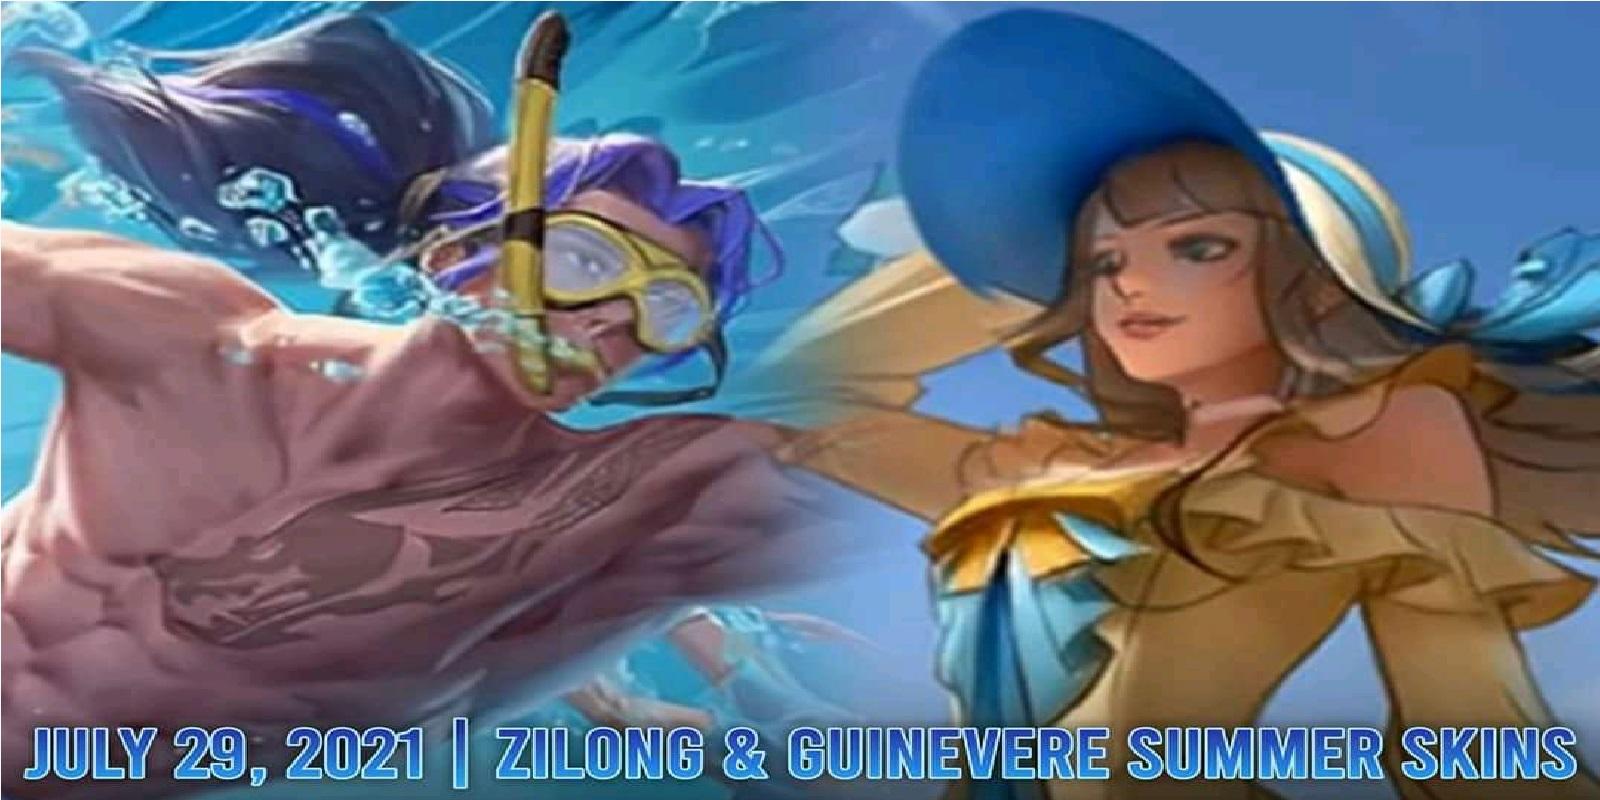 Zilong & Guinevere Special Summer Skin Release Date Mobile Legends (ML) – Esports